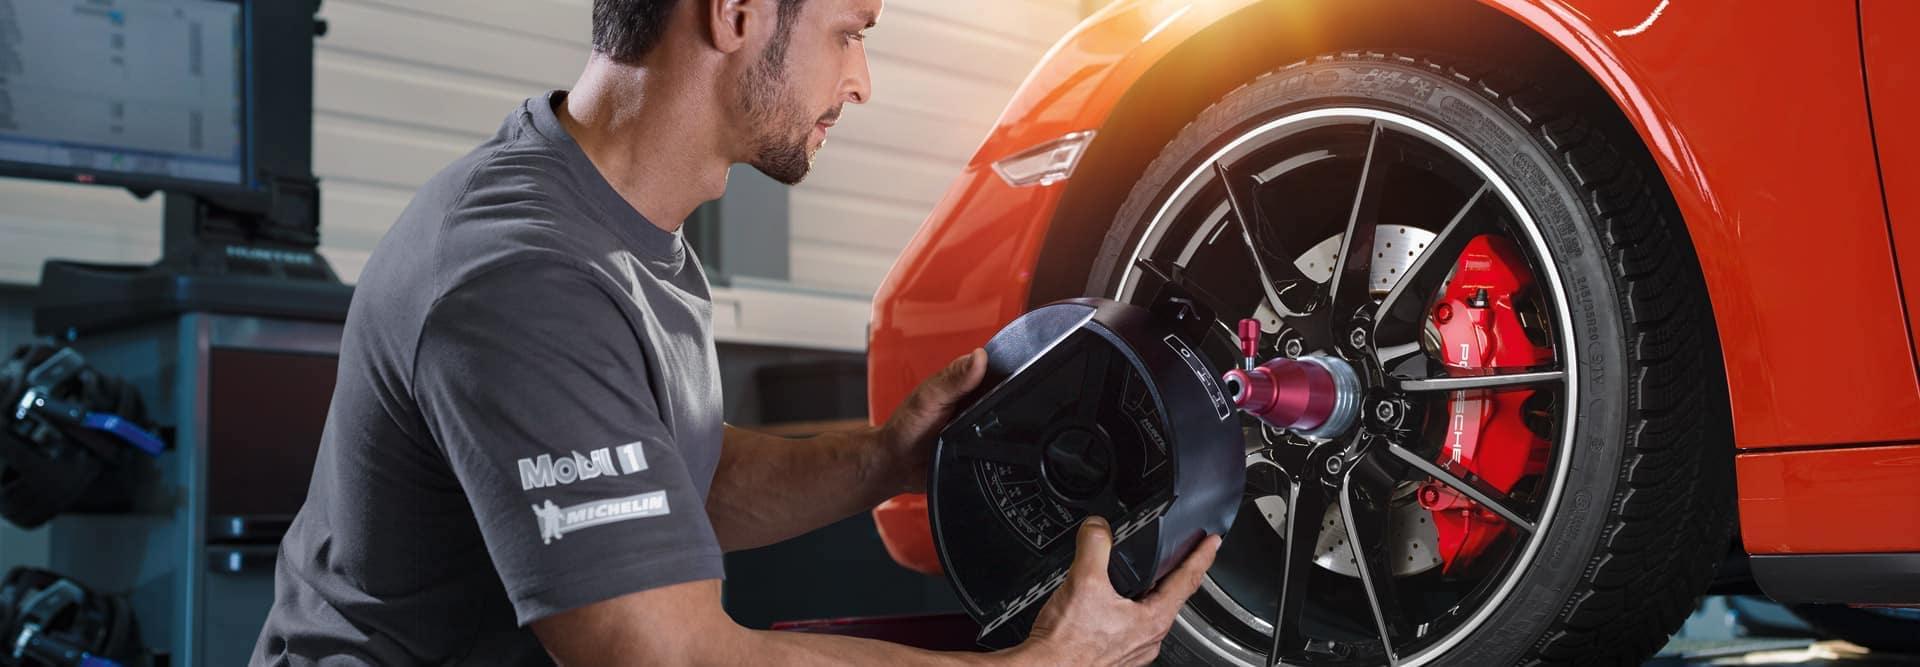 mechanic working on tires